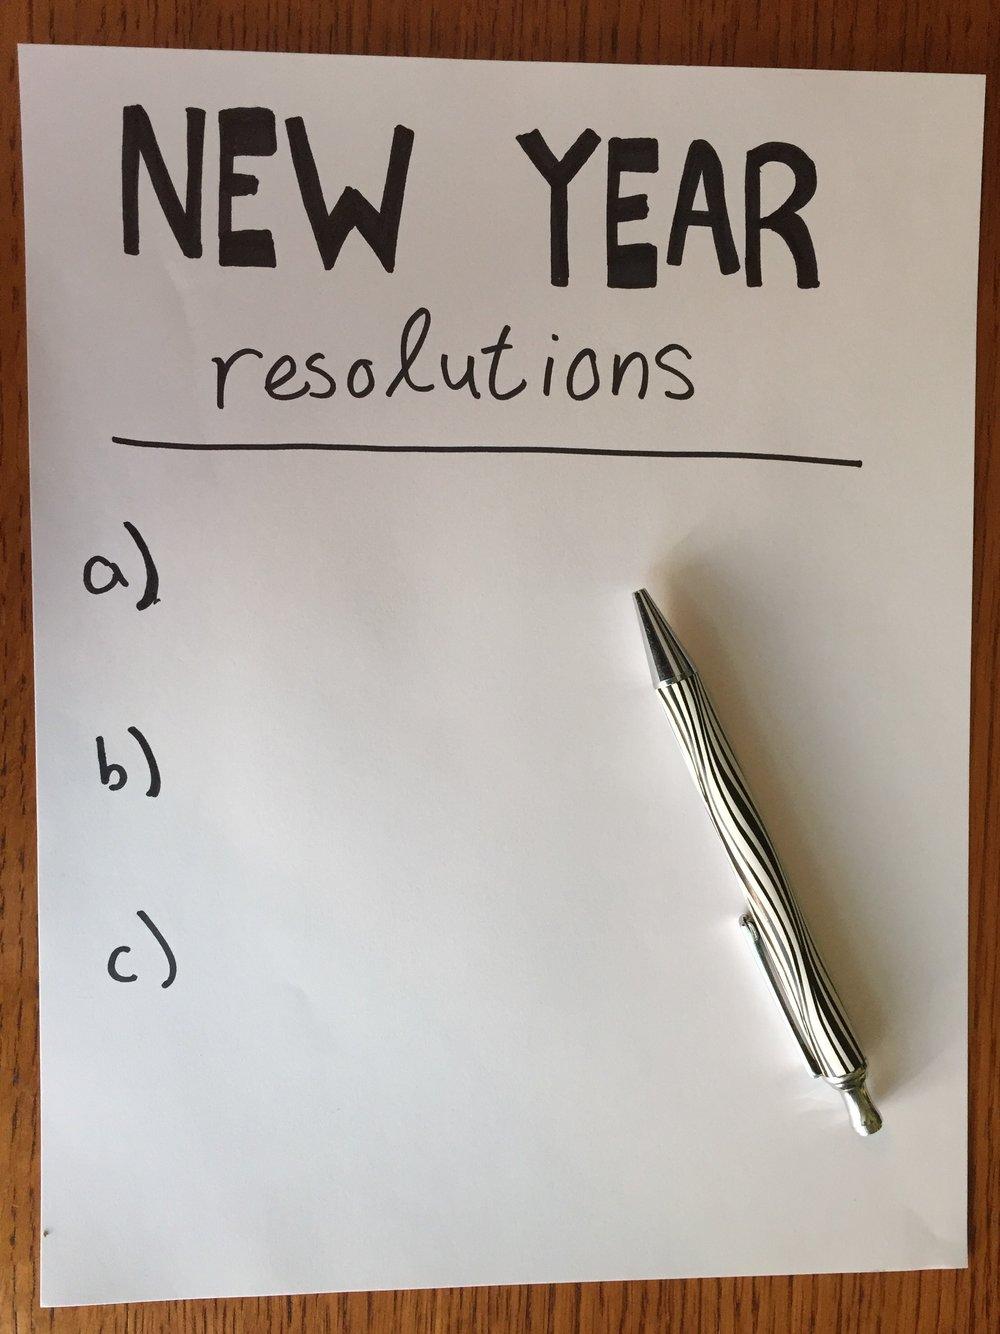 New-Year-resolutions-mine-1-e1451259831572.jpg